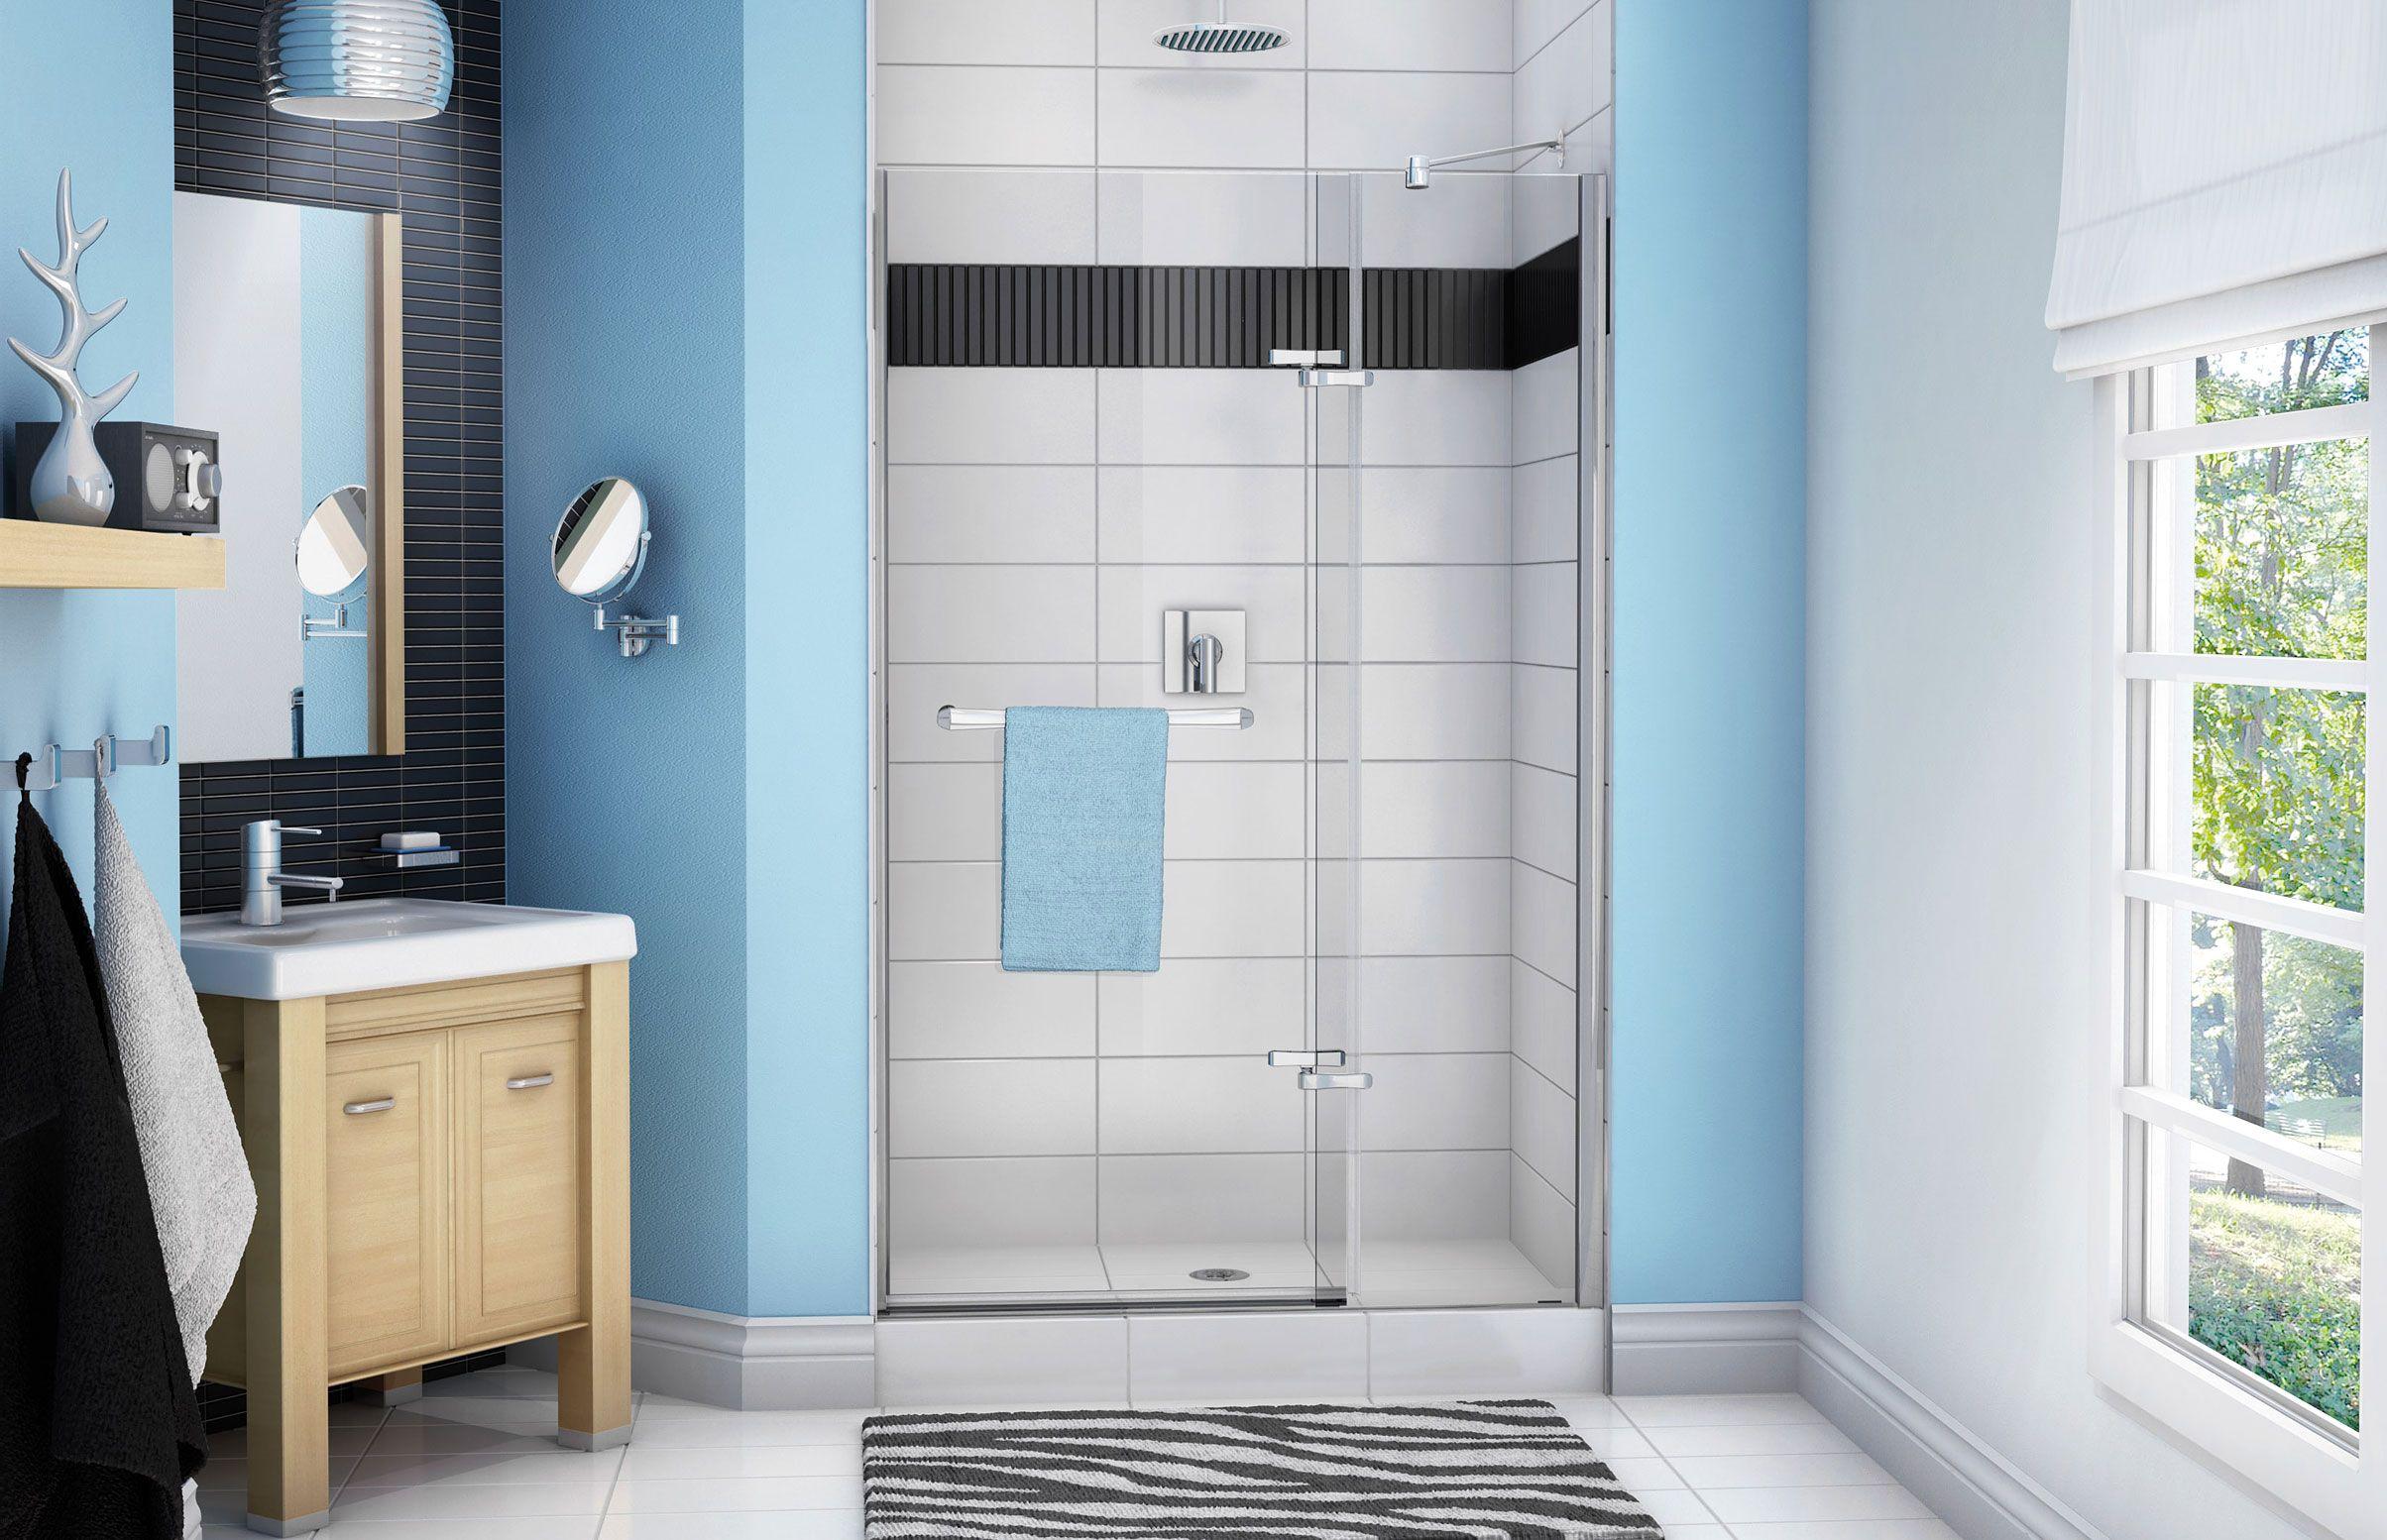 MAAX - Reveal Alcove Shower Door www.maax.com | Maax Shower Doors ...